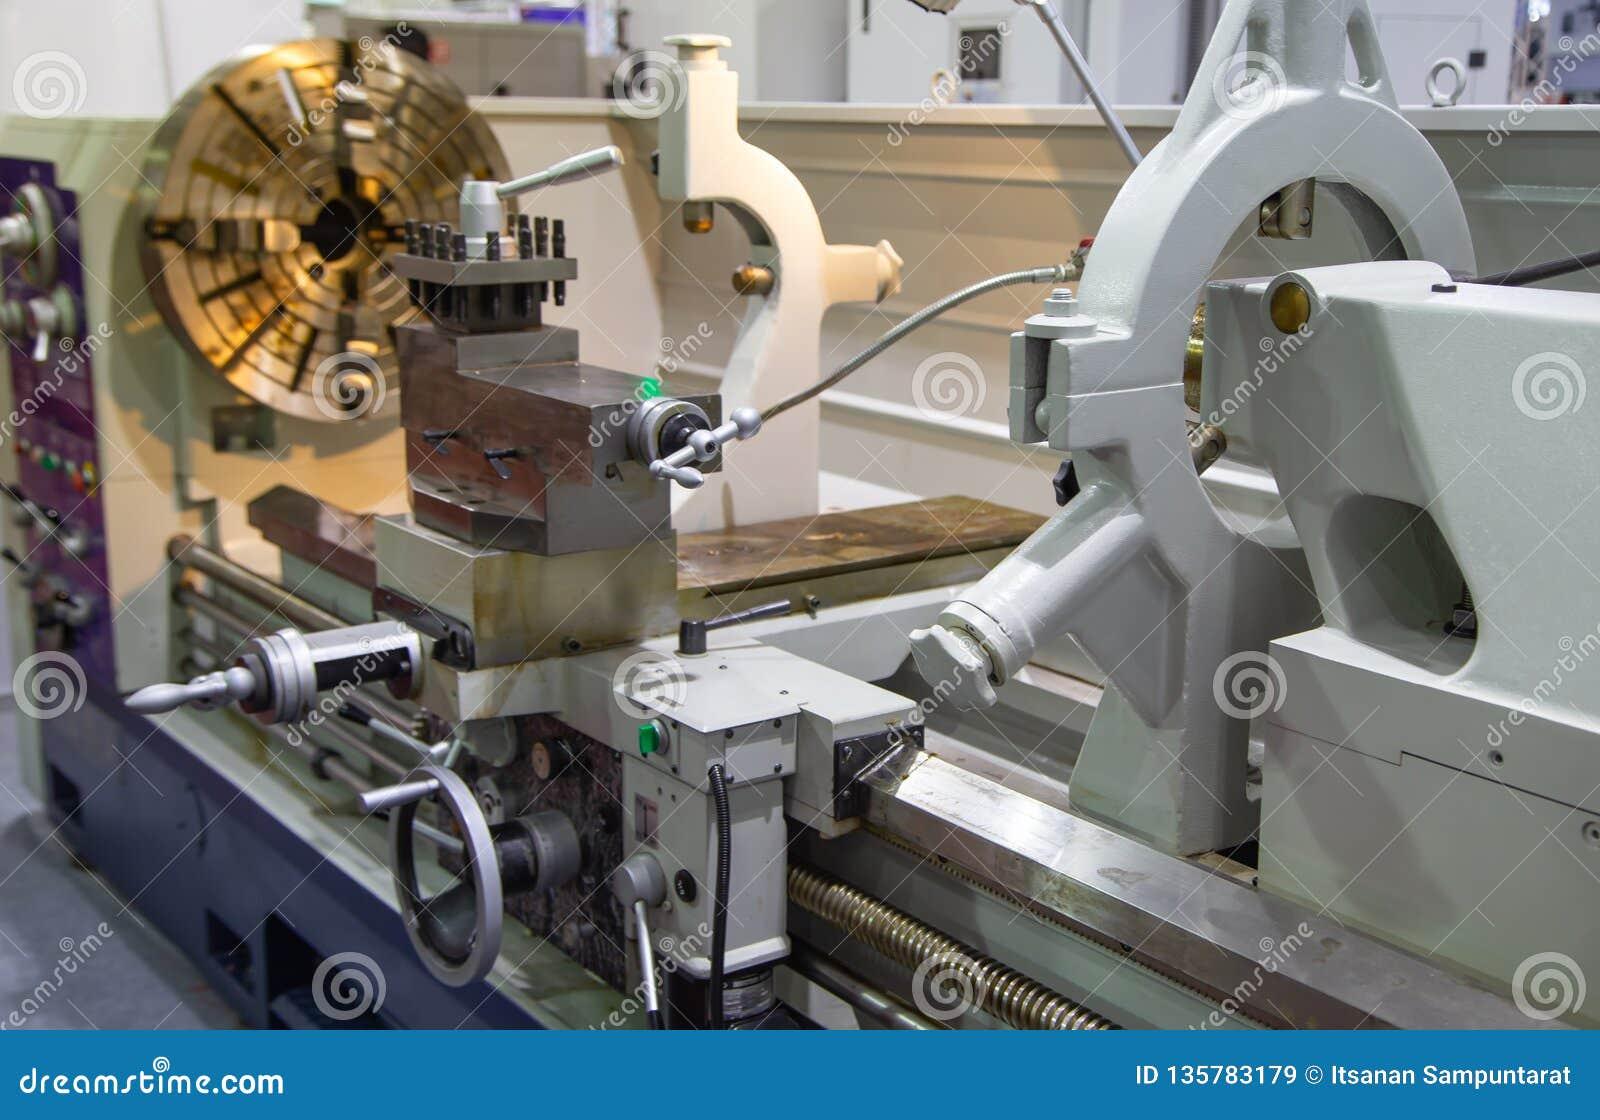 Manual Lathe Machine Stock Image Image Of Machining Manual Guide